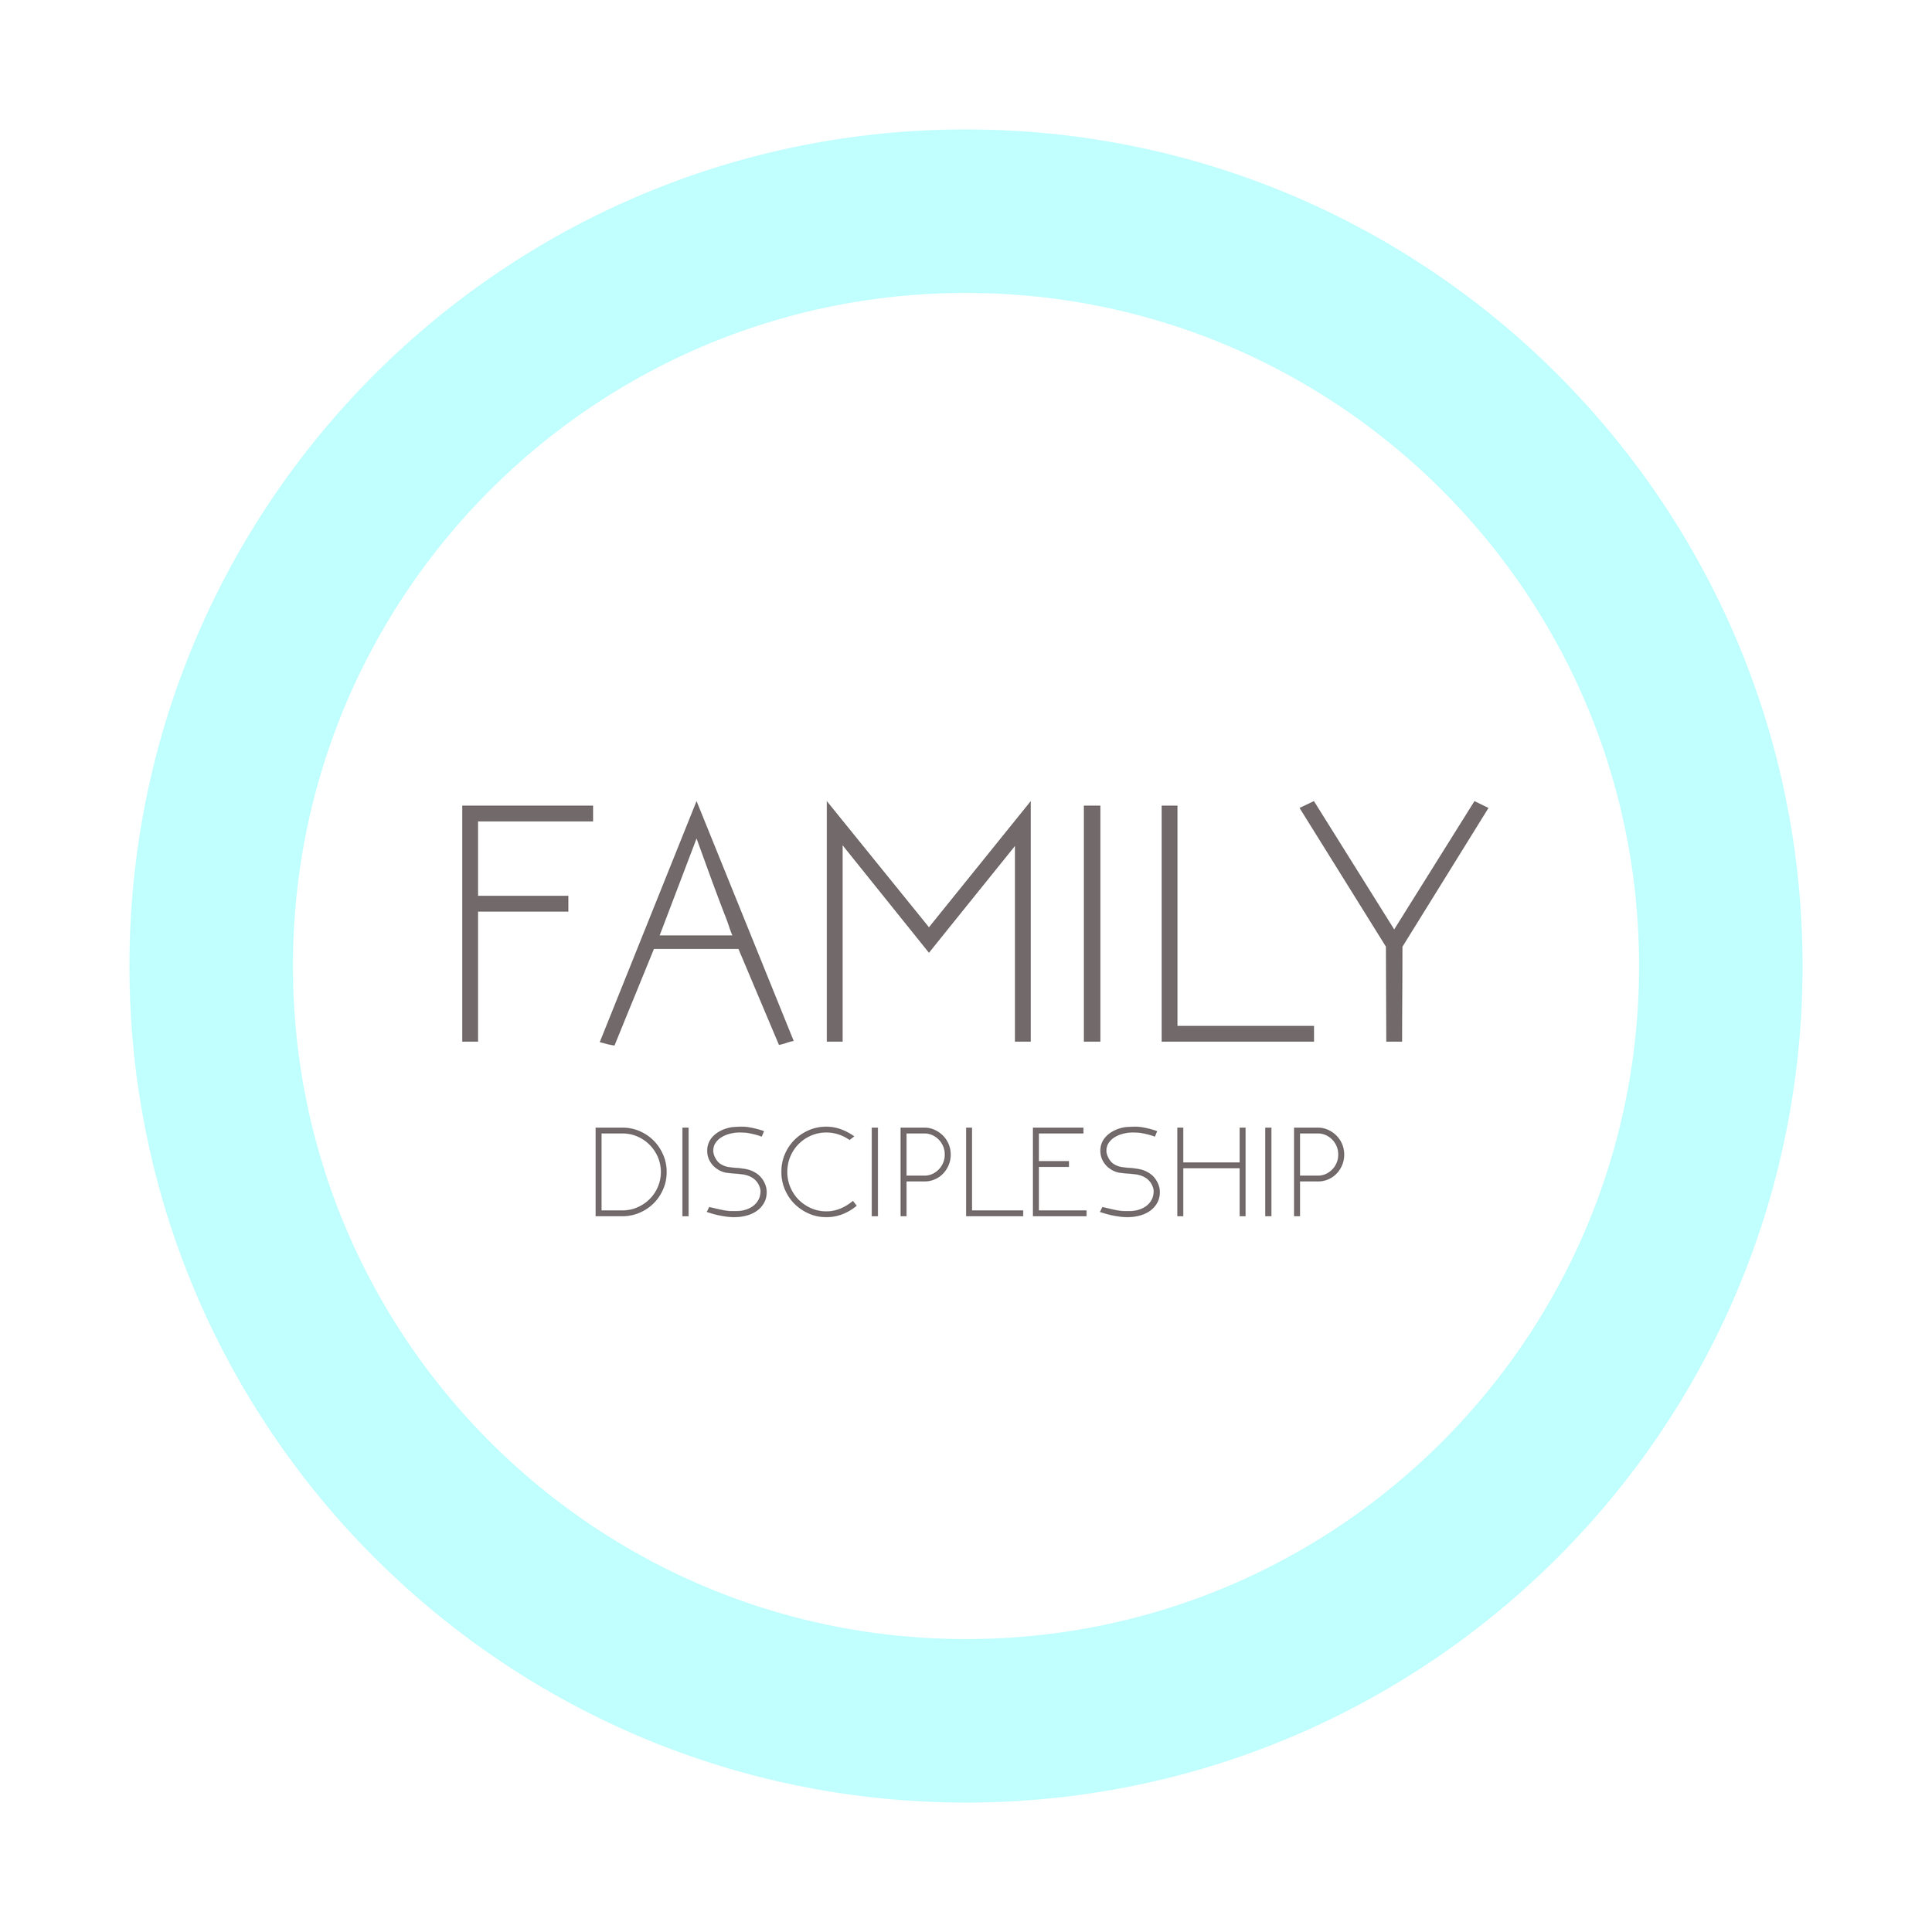 Family Discipleship — Greenbriar Church